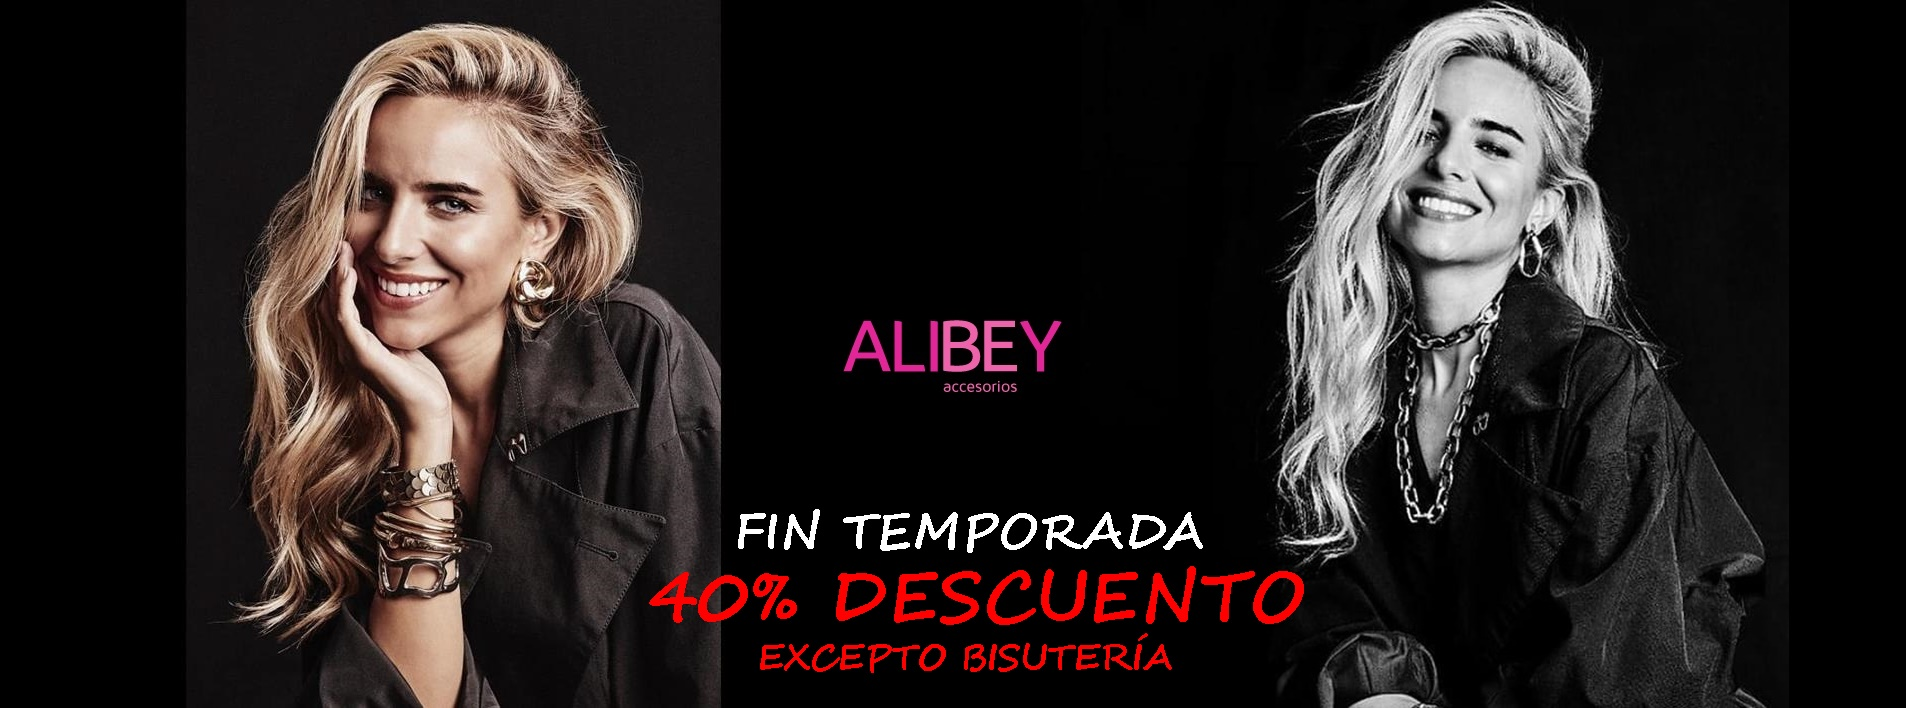 alibey-segundas-rebajas-banner